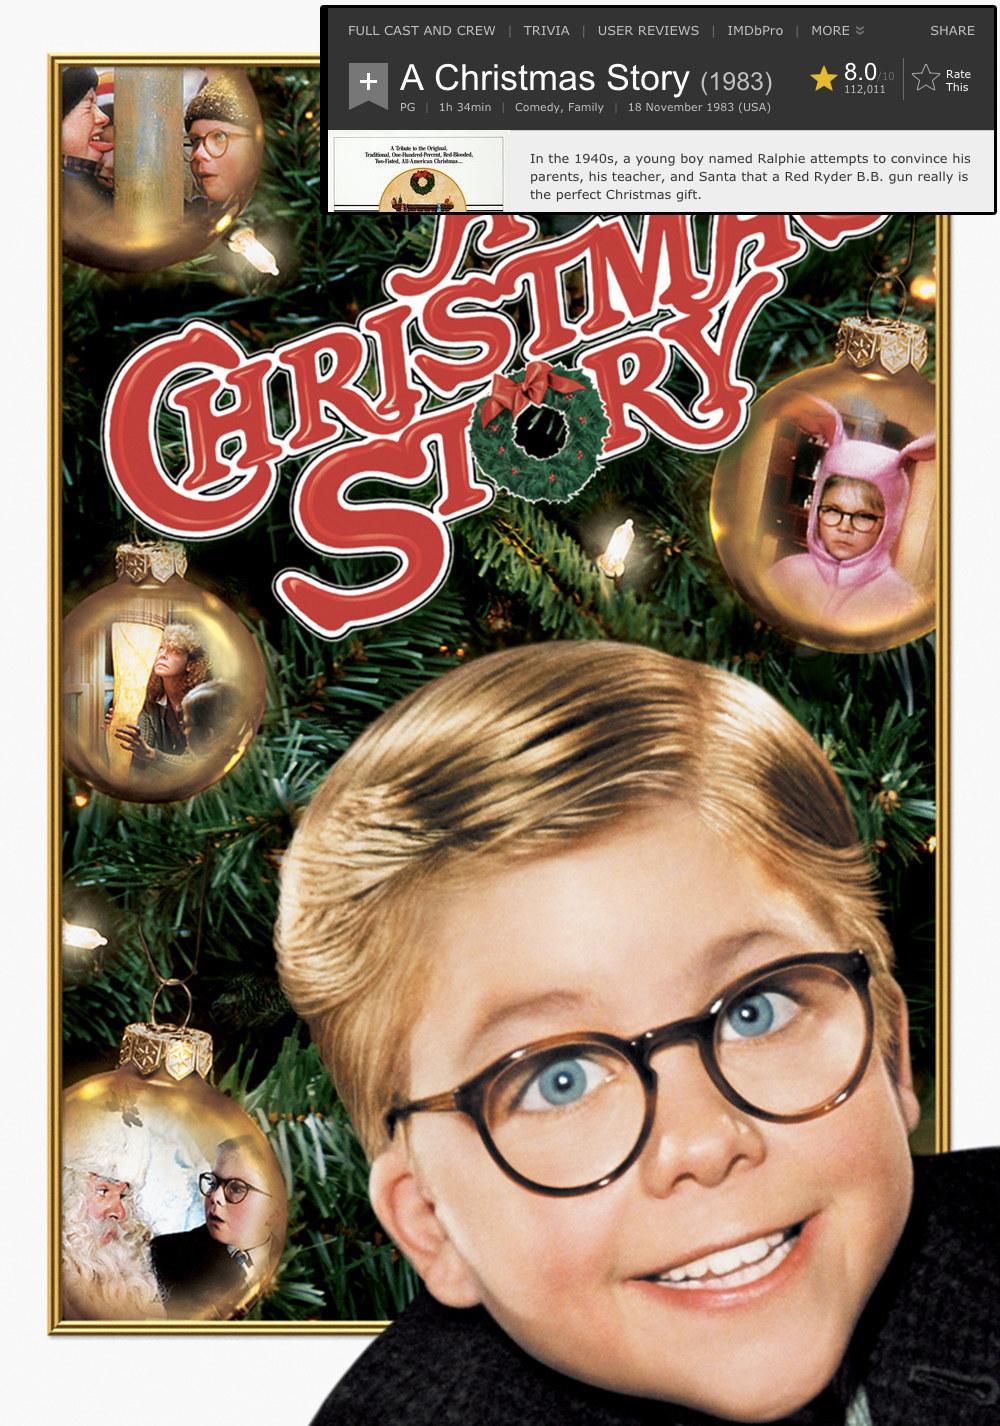 17 Popular Christmas Movies Ranked Worst To Best According To IMDb ...